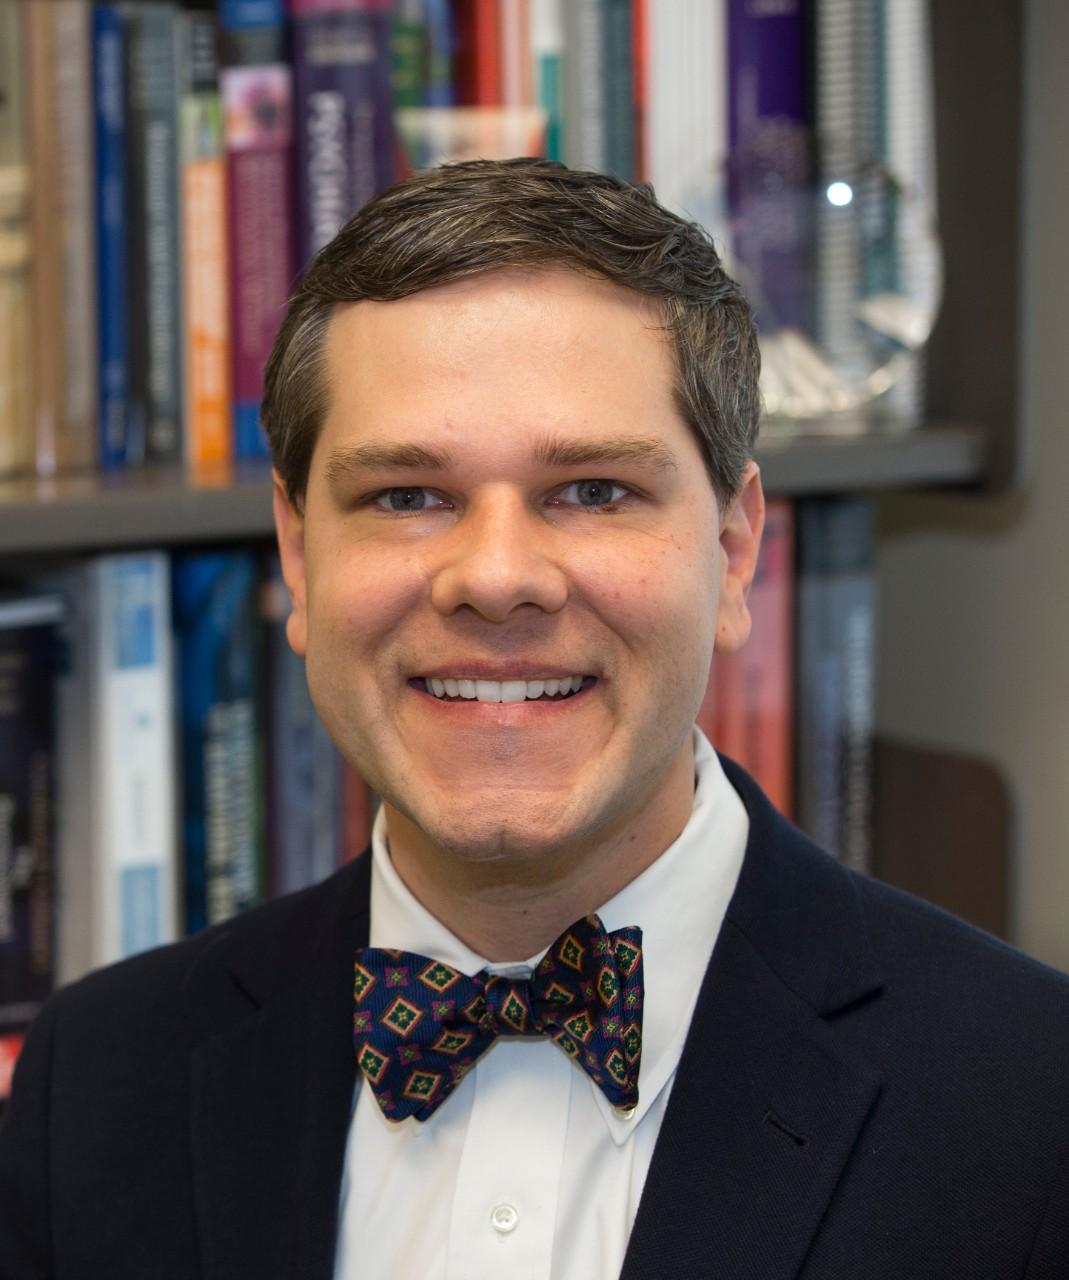 Jeffrey Strawn, MD, associate professor of psychiatry